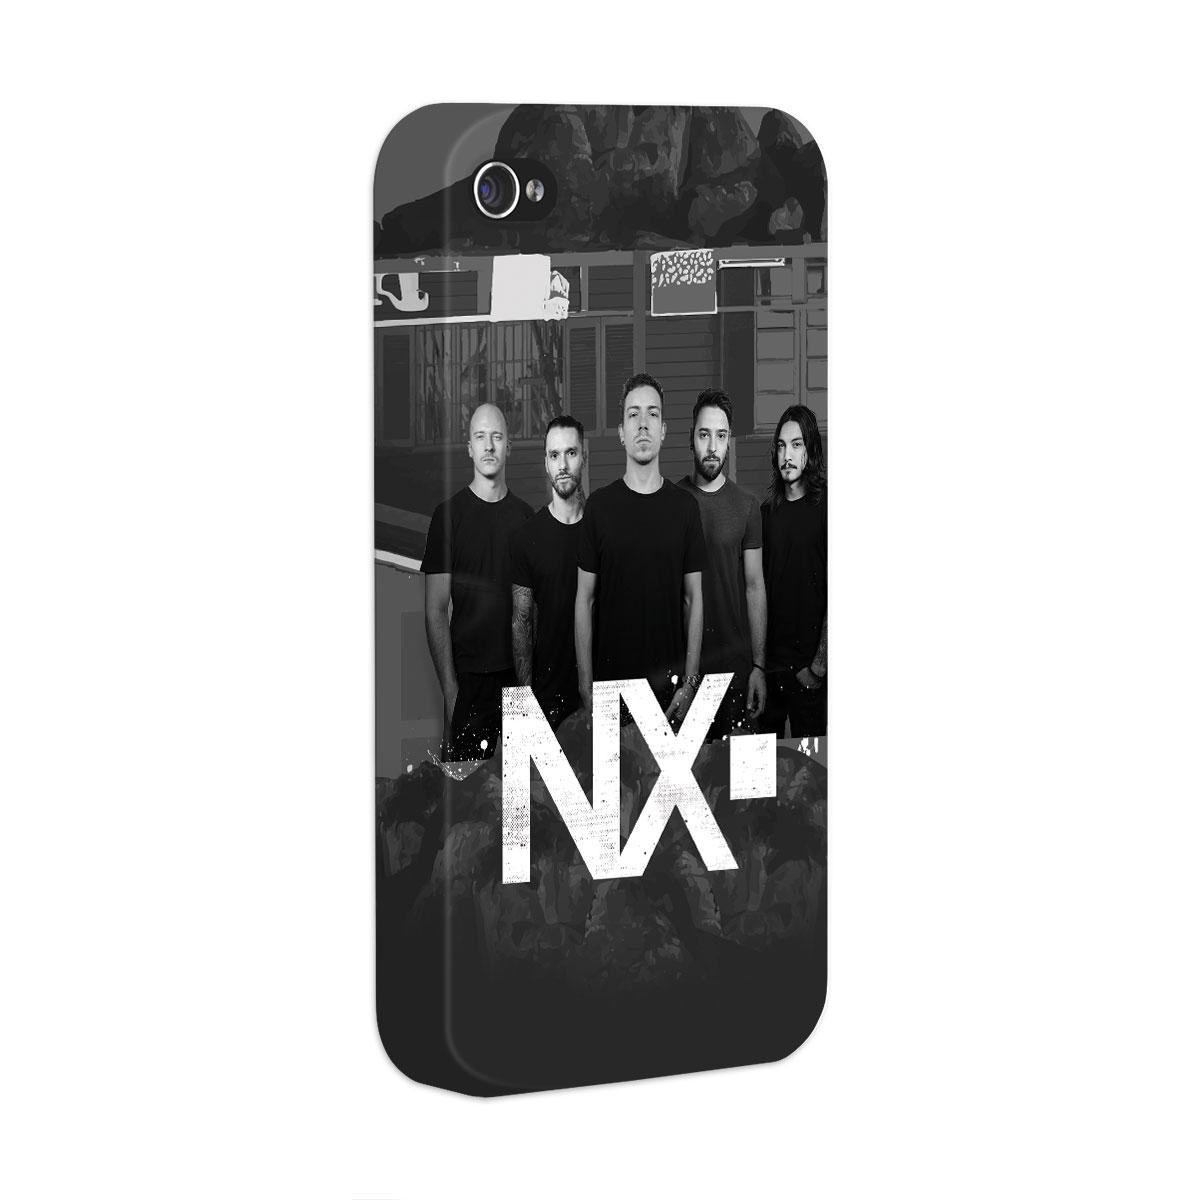 Capa para iPhone 4/4S NXZero Foto